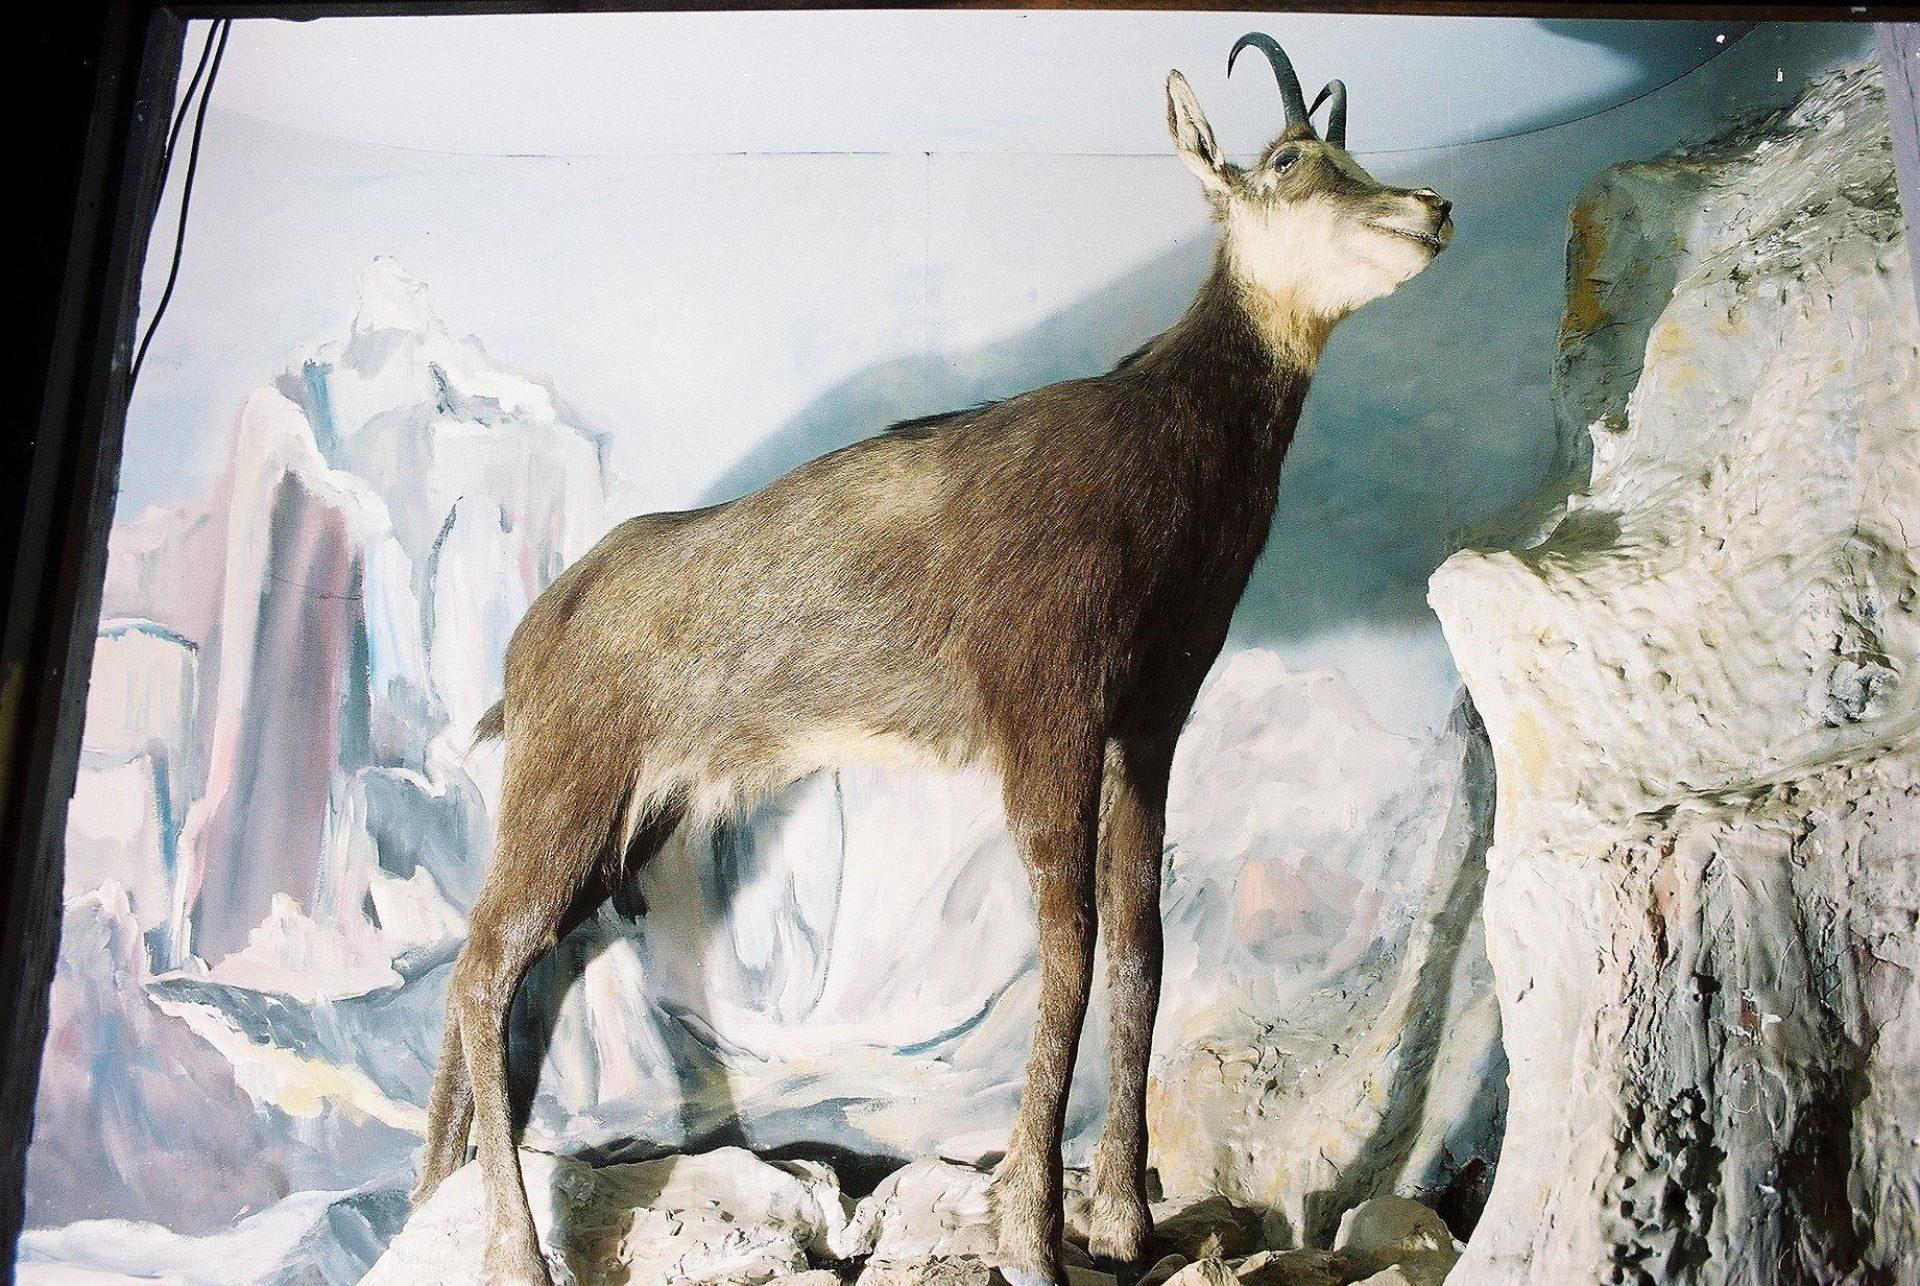 Petrit Halilaj, Special Edition (ex-Natural History Museum of Kosovo), 2013 (37/80)